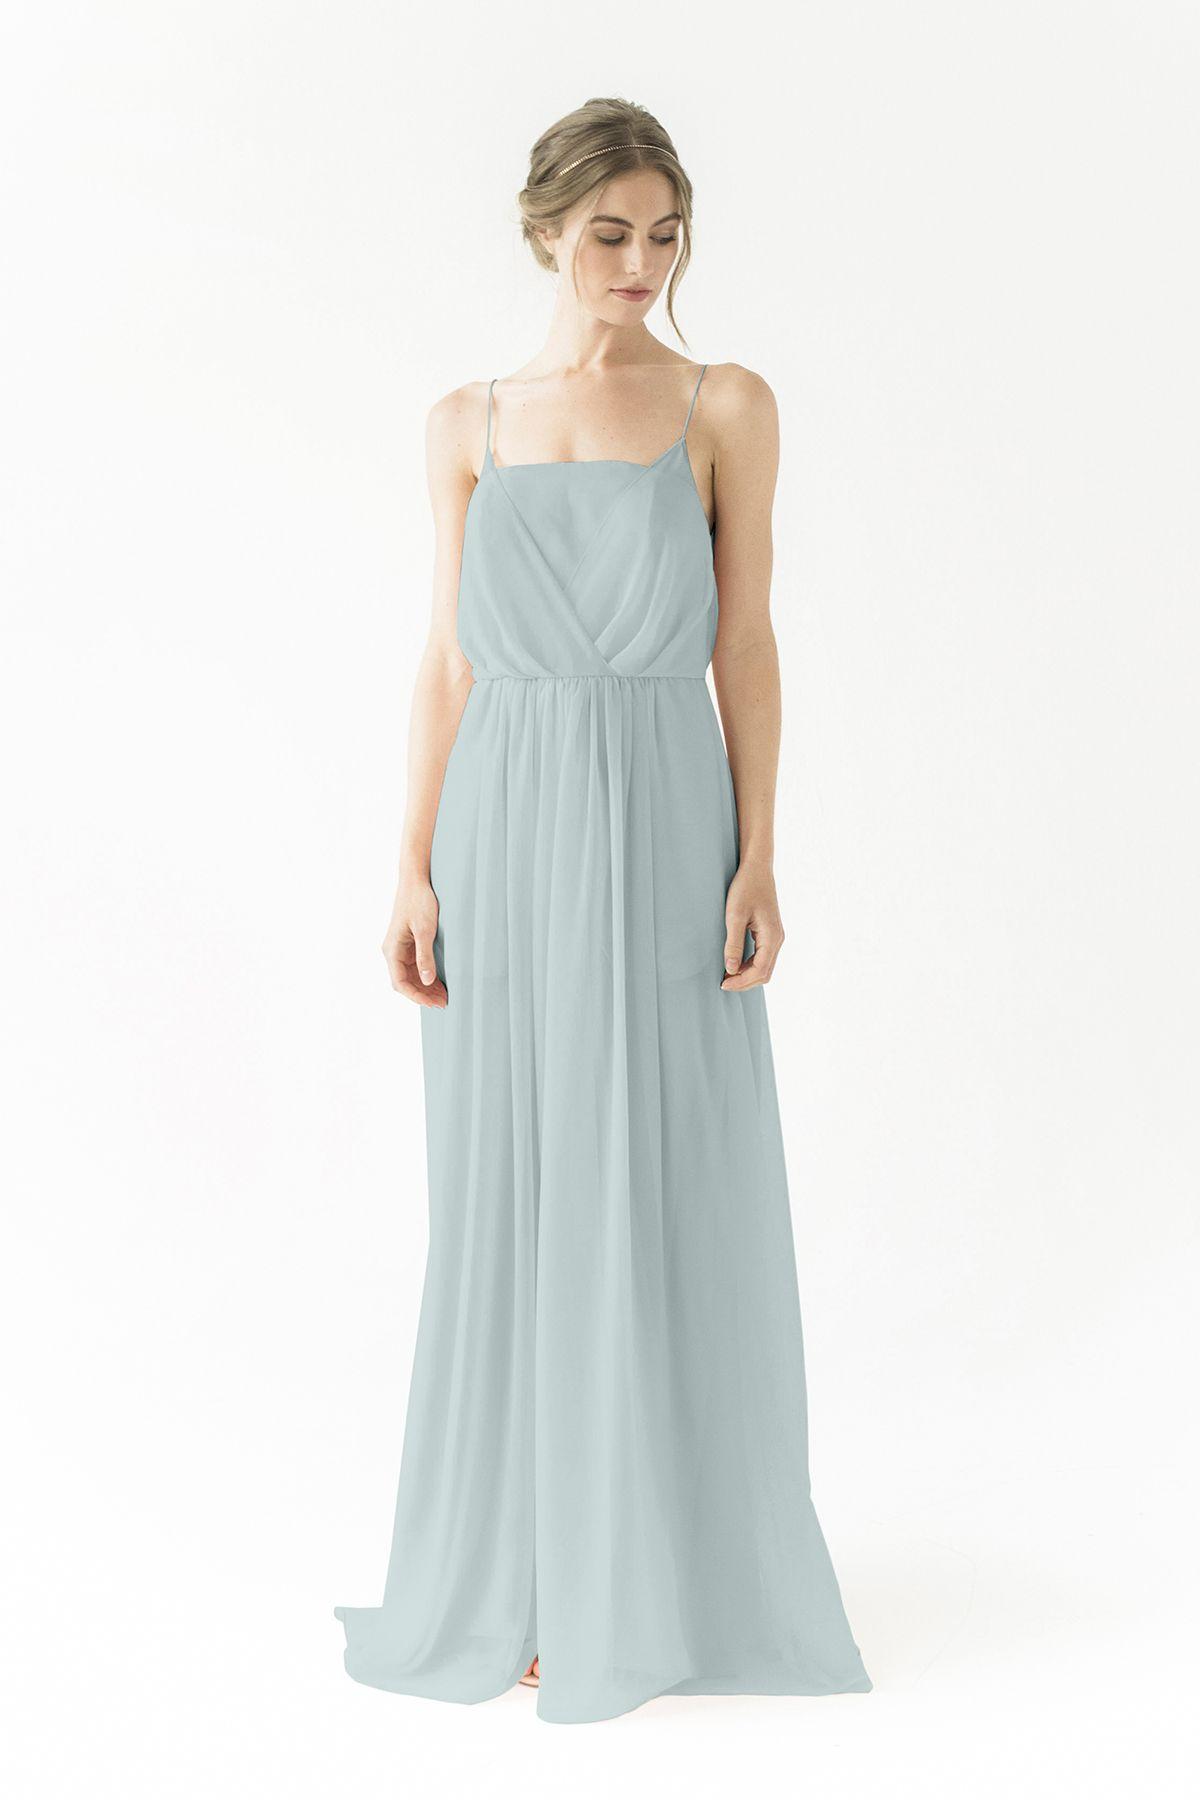 Hazel | Favorite color, Bridal parties and Party fashion